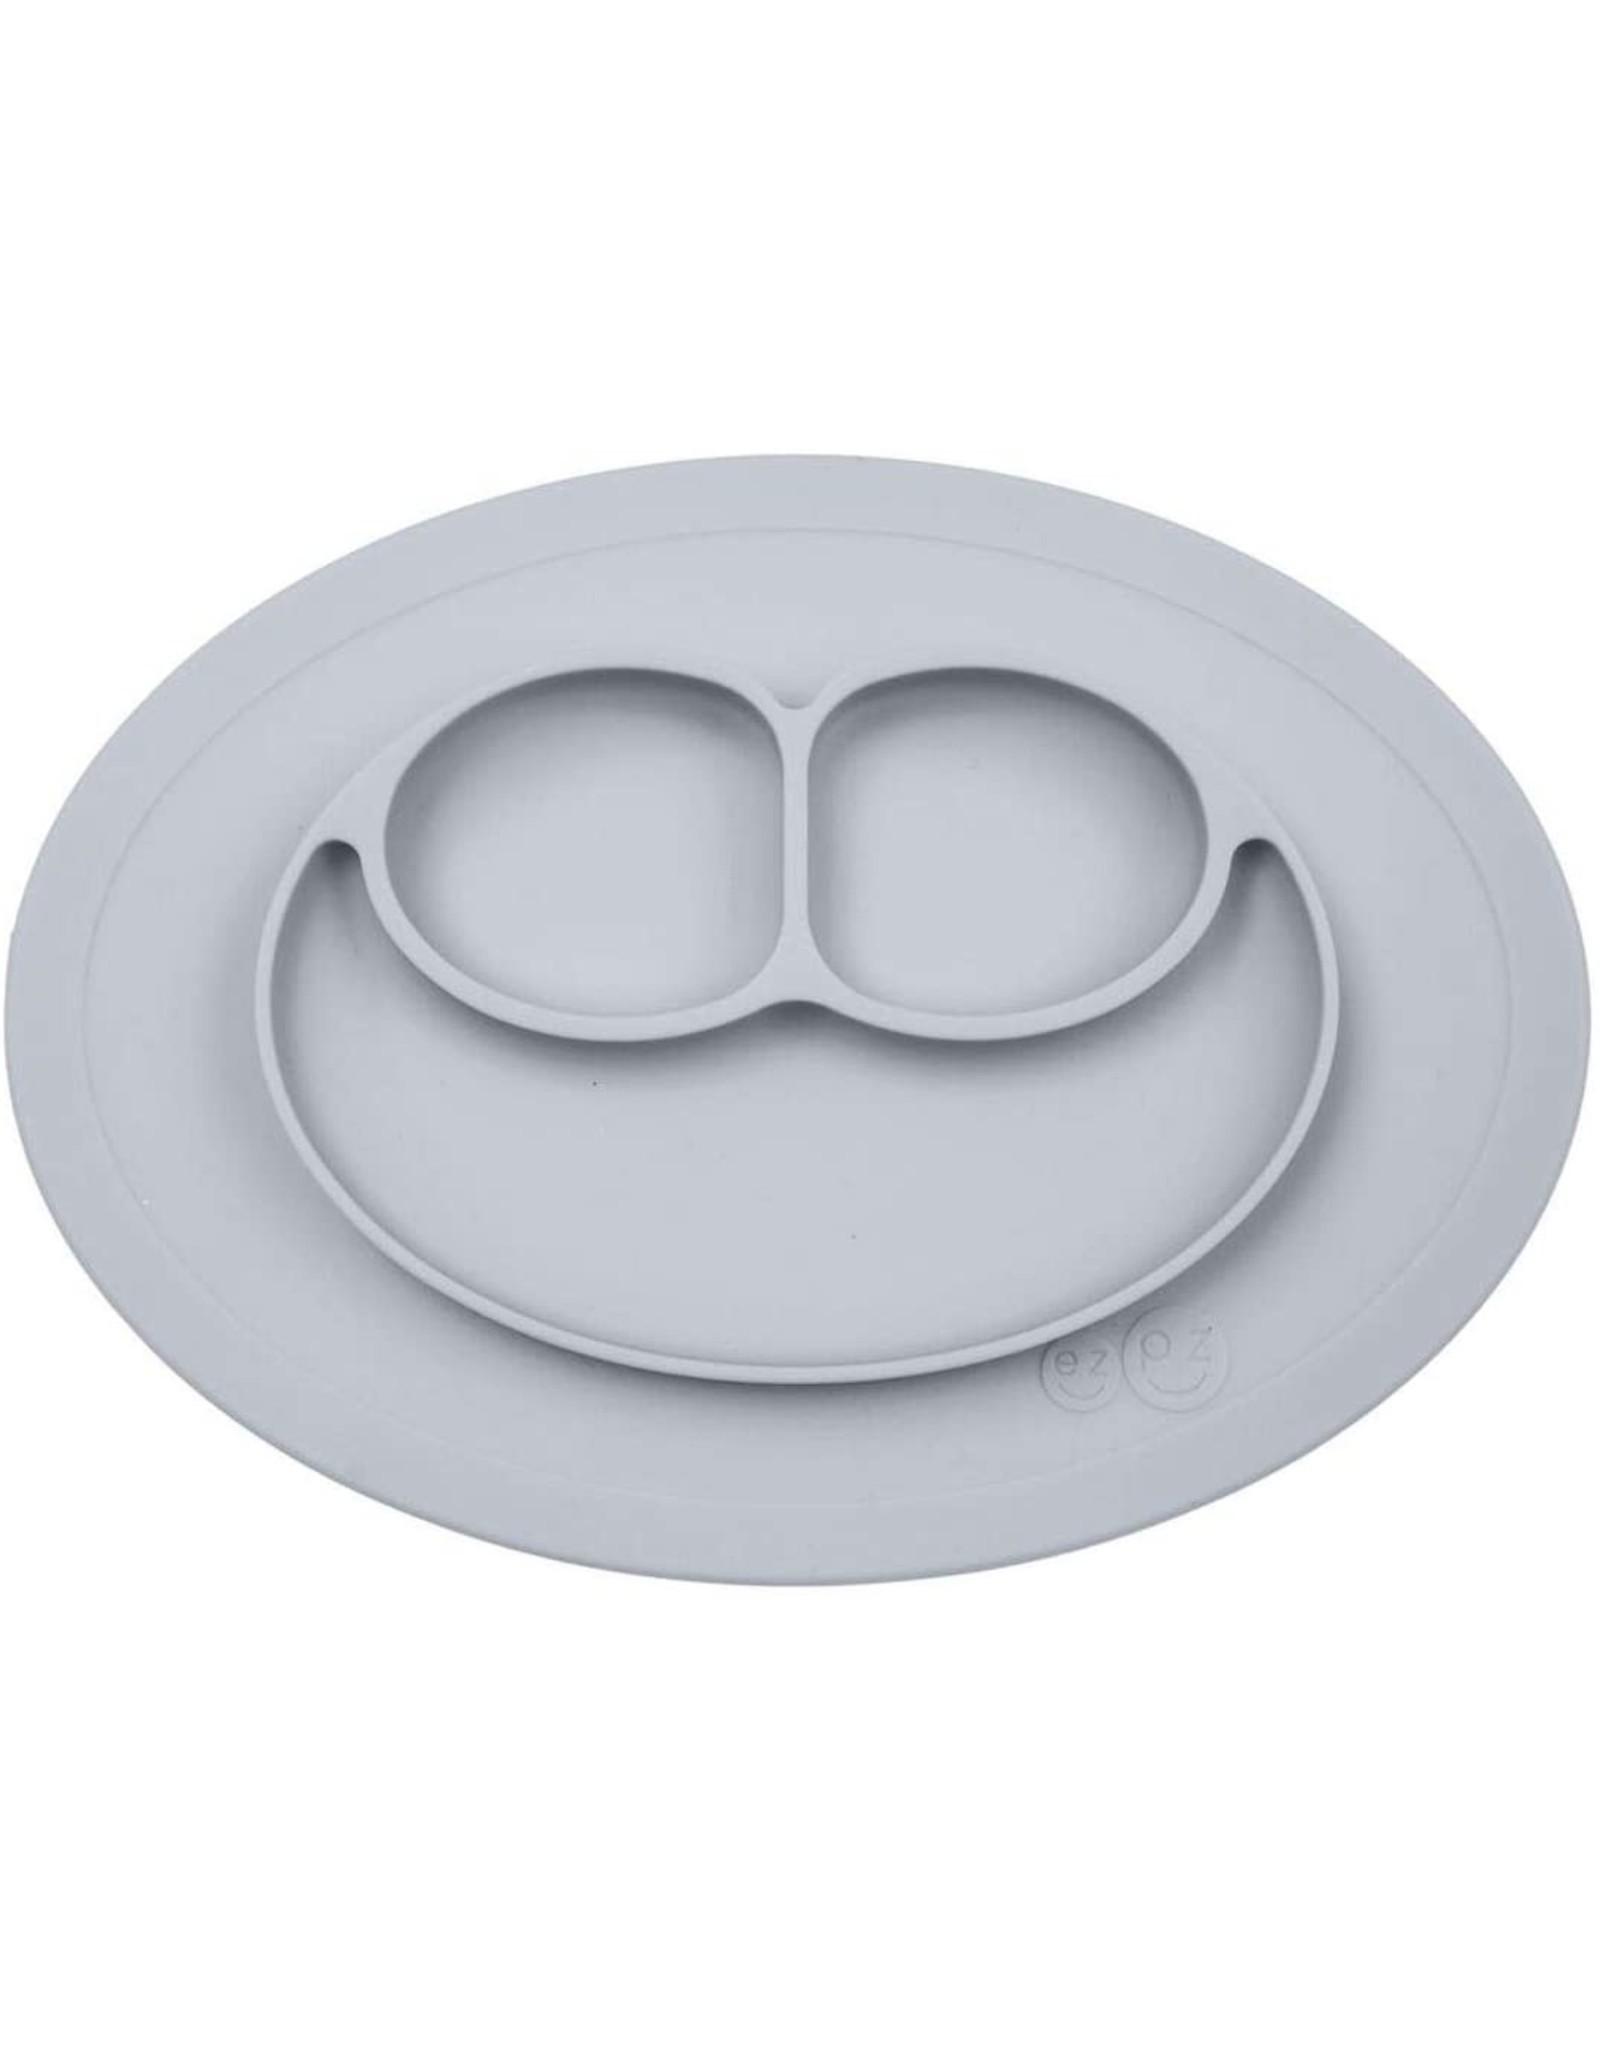 EZPZ Assiette silicone anti dérapante  - gris